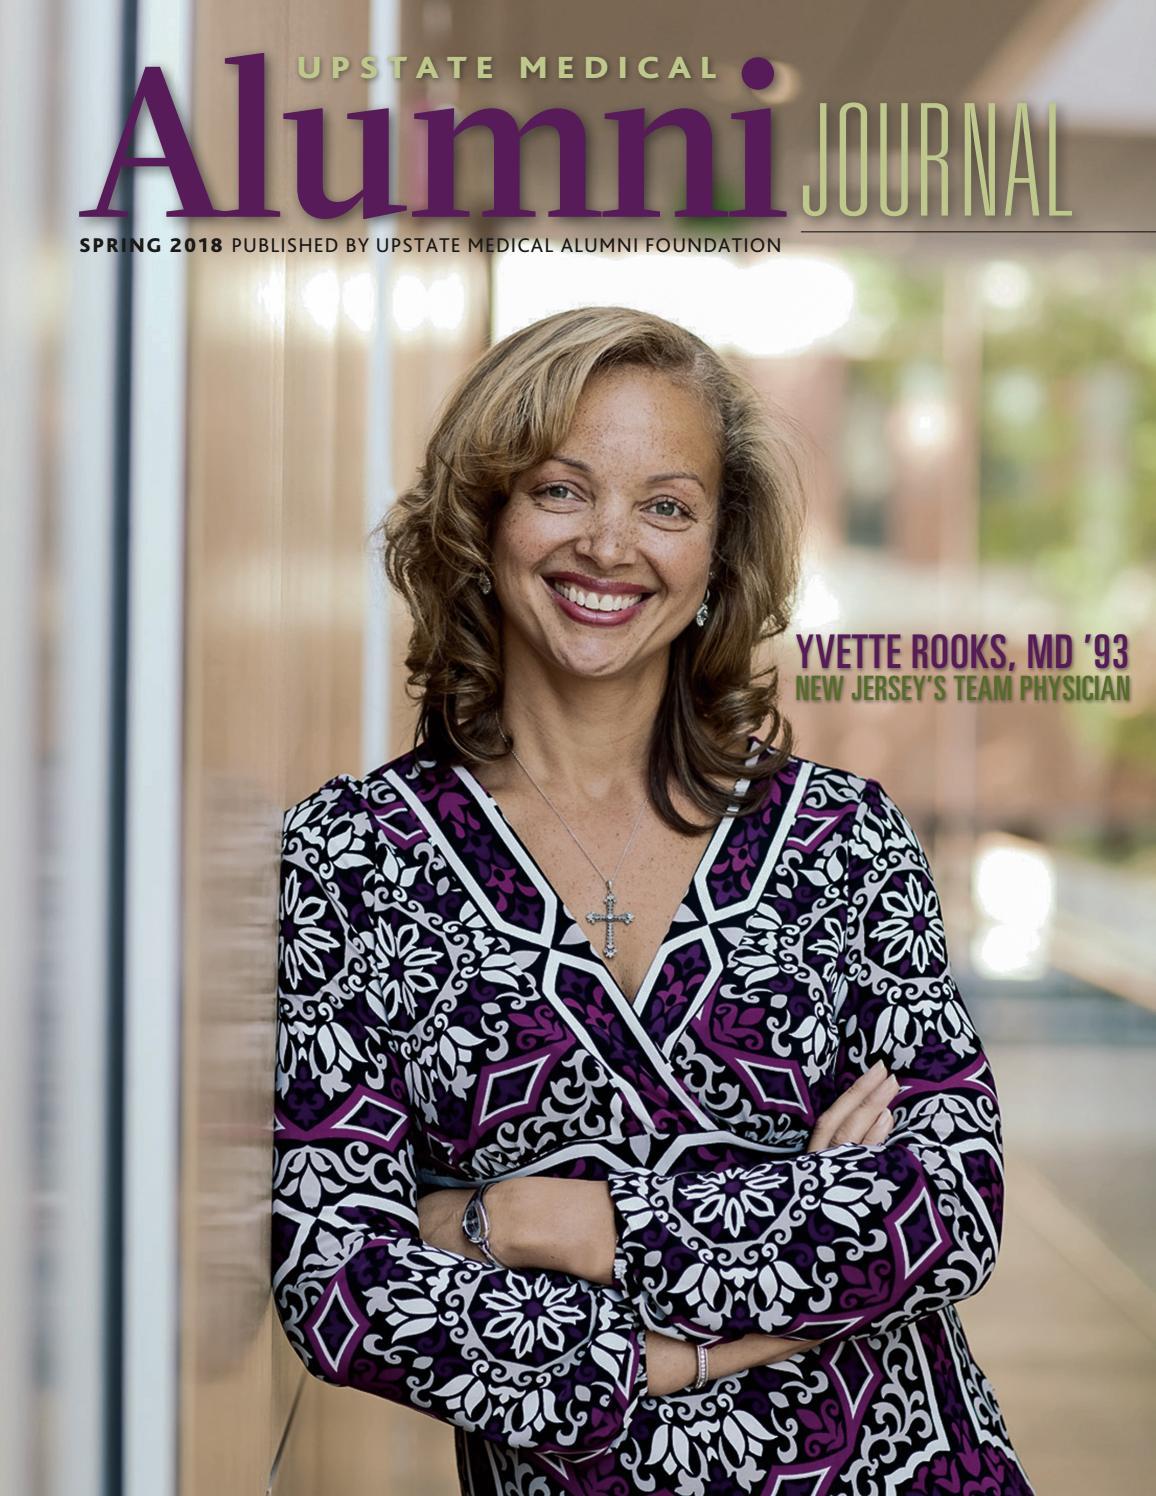 Upstate Medical Alumni Journal SP2018 by Kiefer Creative - issuu